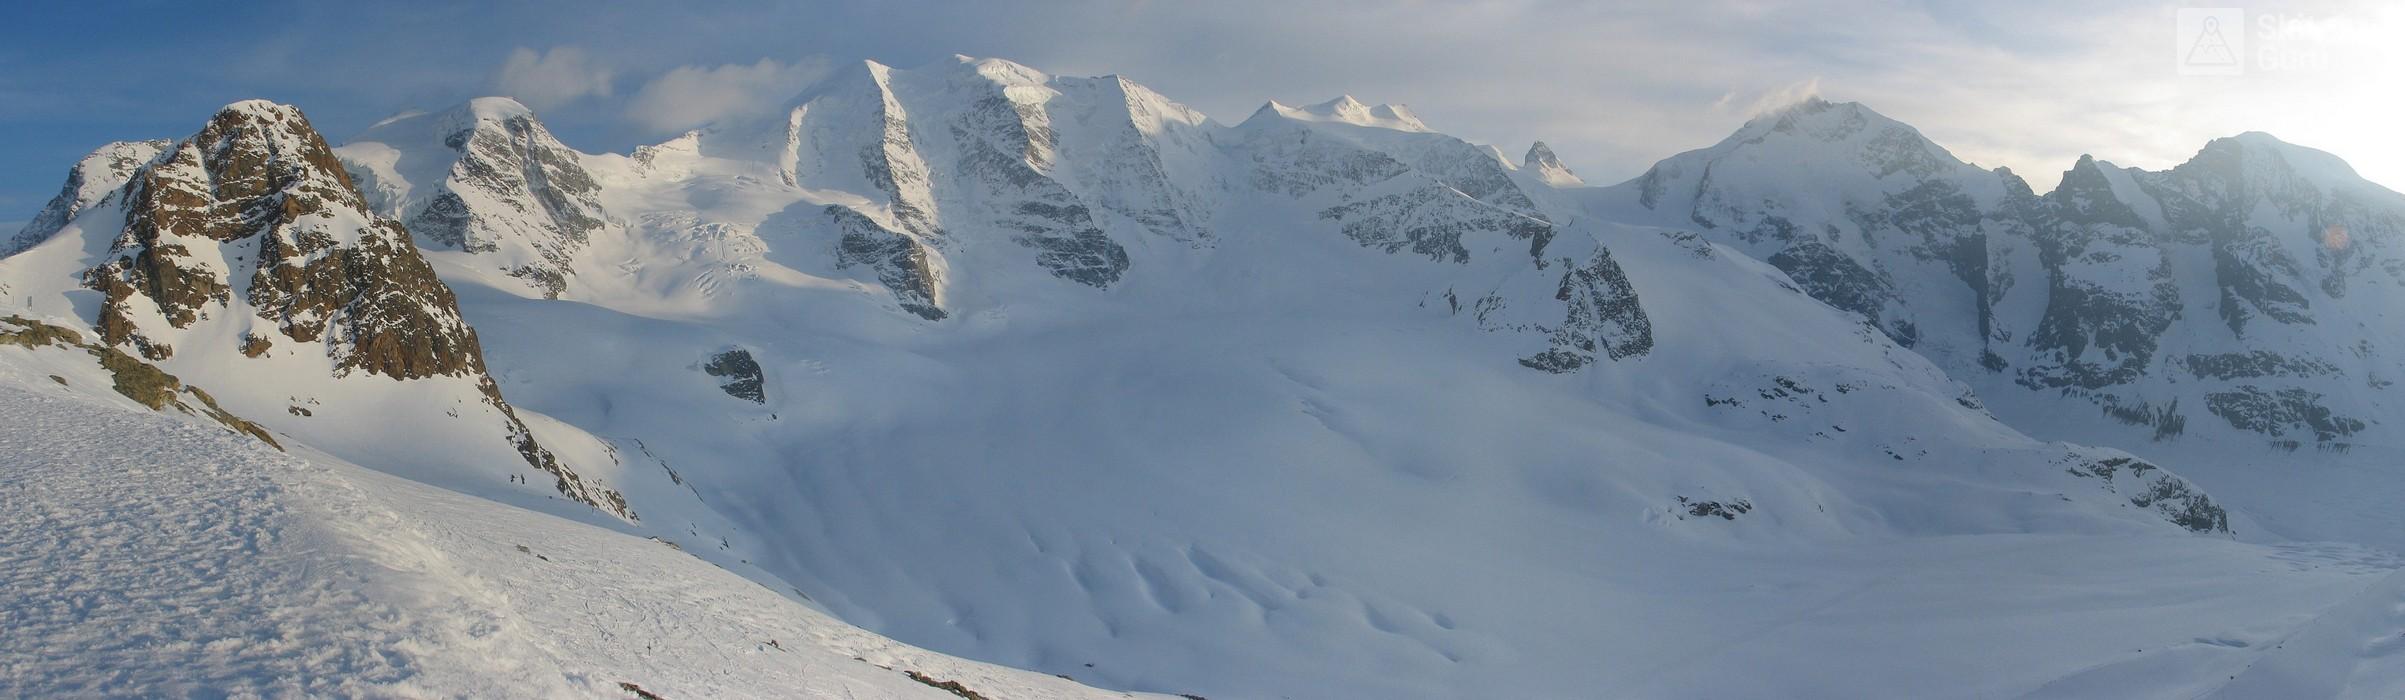 Morteratsch Glacier freetour Bernina Švýcarsko panorama 41